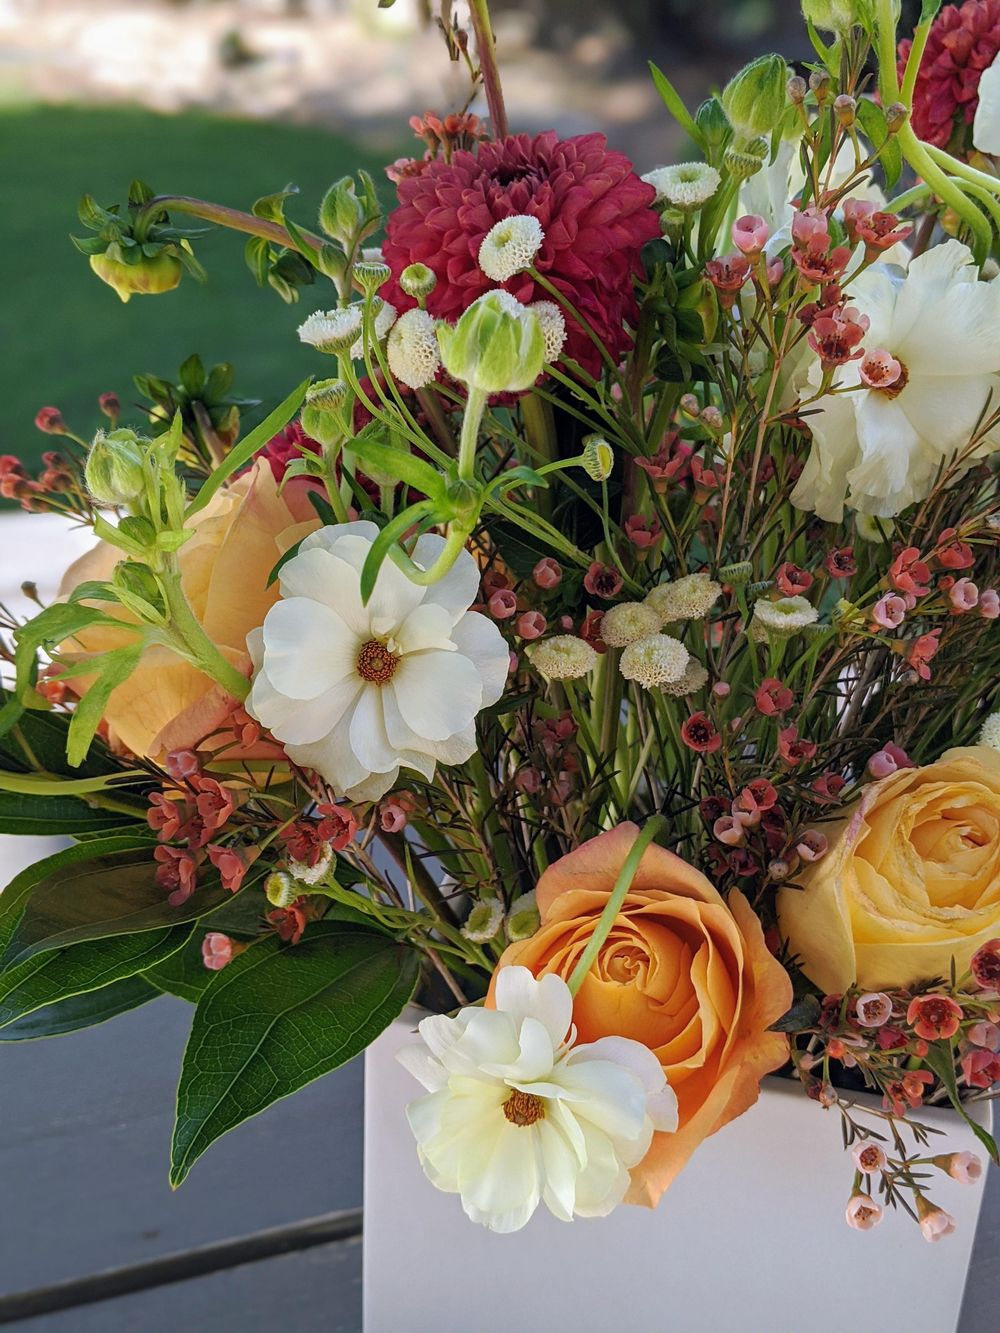 Artful Florals: Advanced Techniques for Centerpiece Design - image 2 - student project